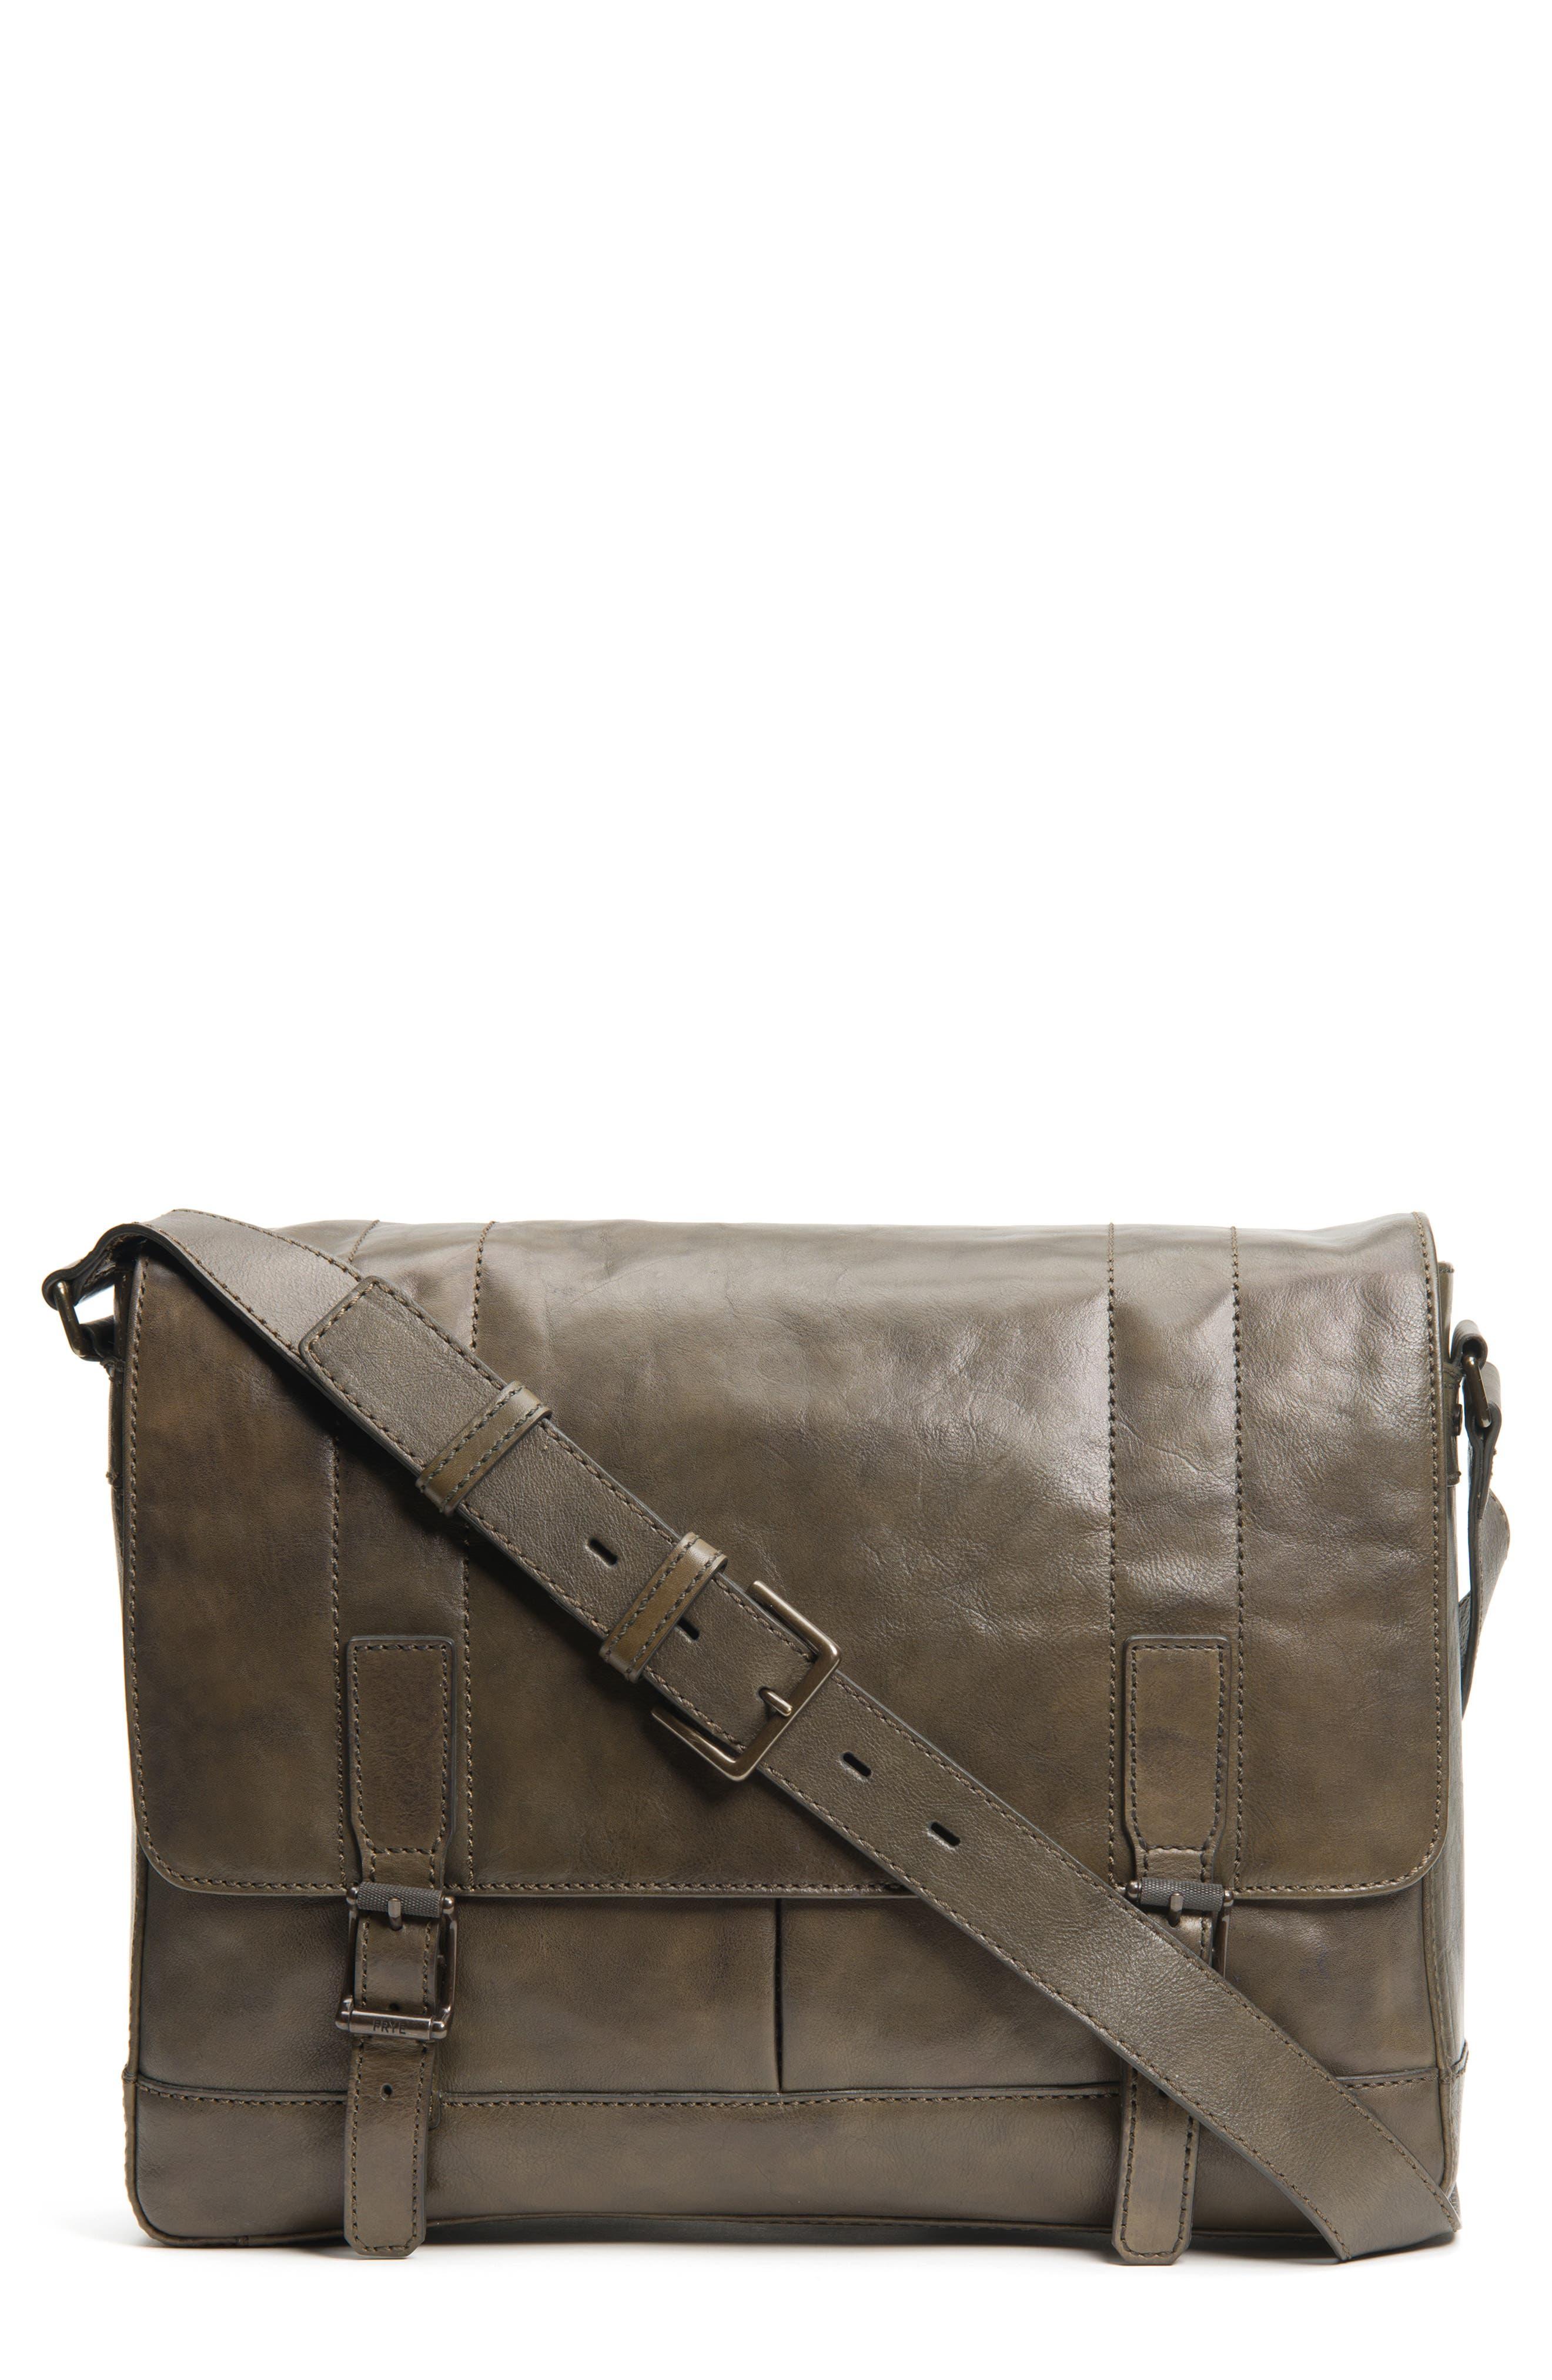 'Oliver' Leather Messenger Bag,                             Main thumbnail 1, color,                             311